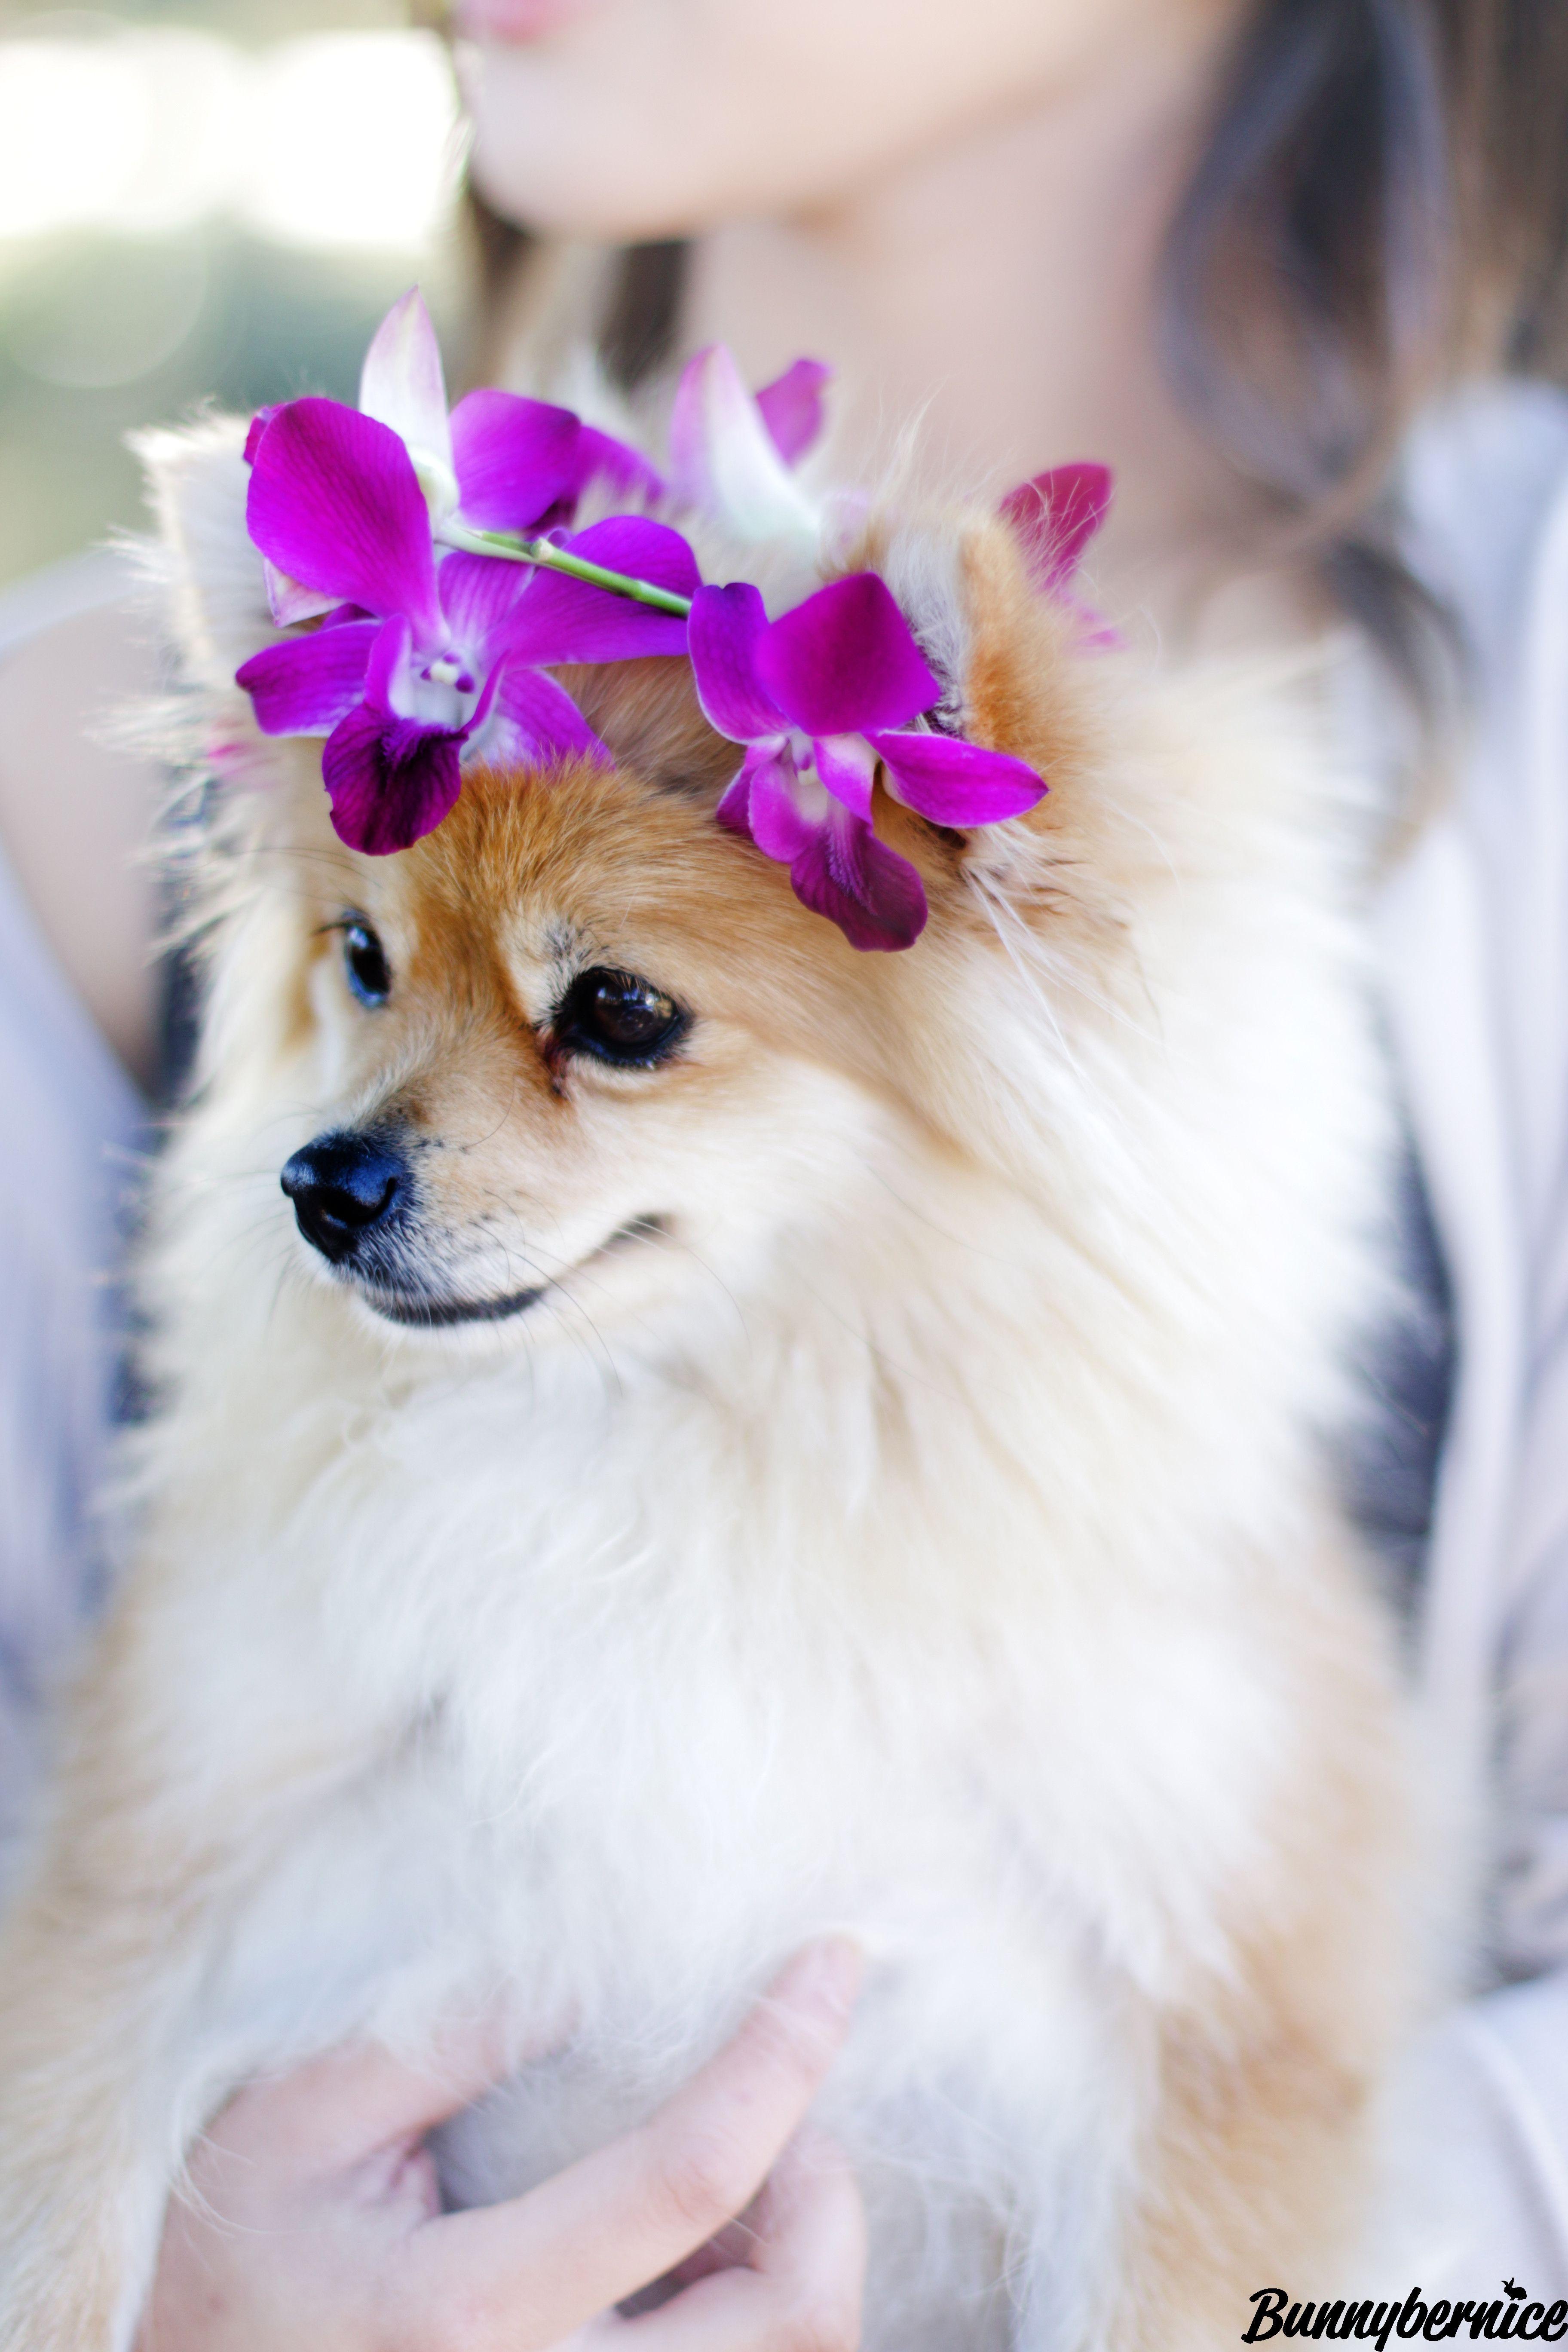 Took my Pomeranian flower child to the dog park | fur babies ...